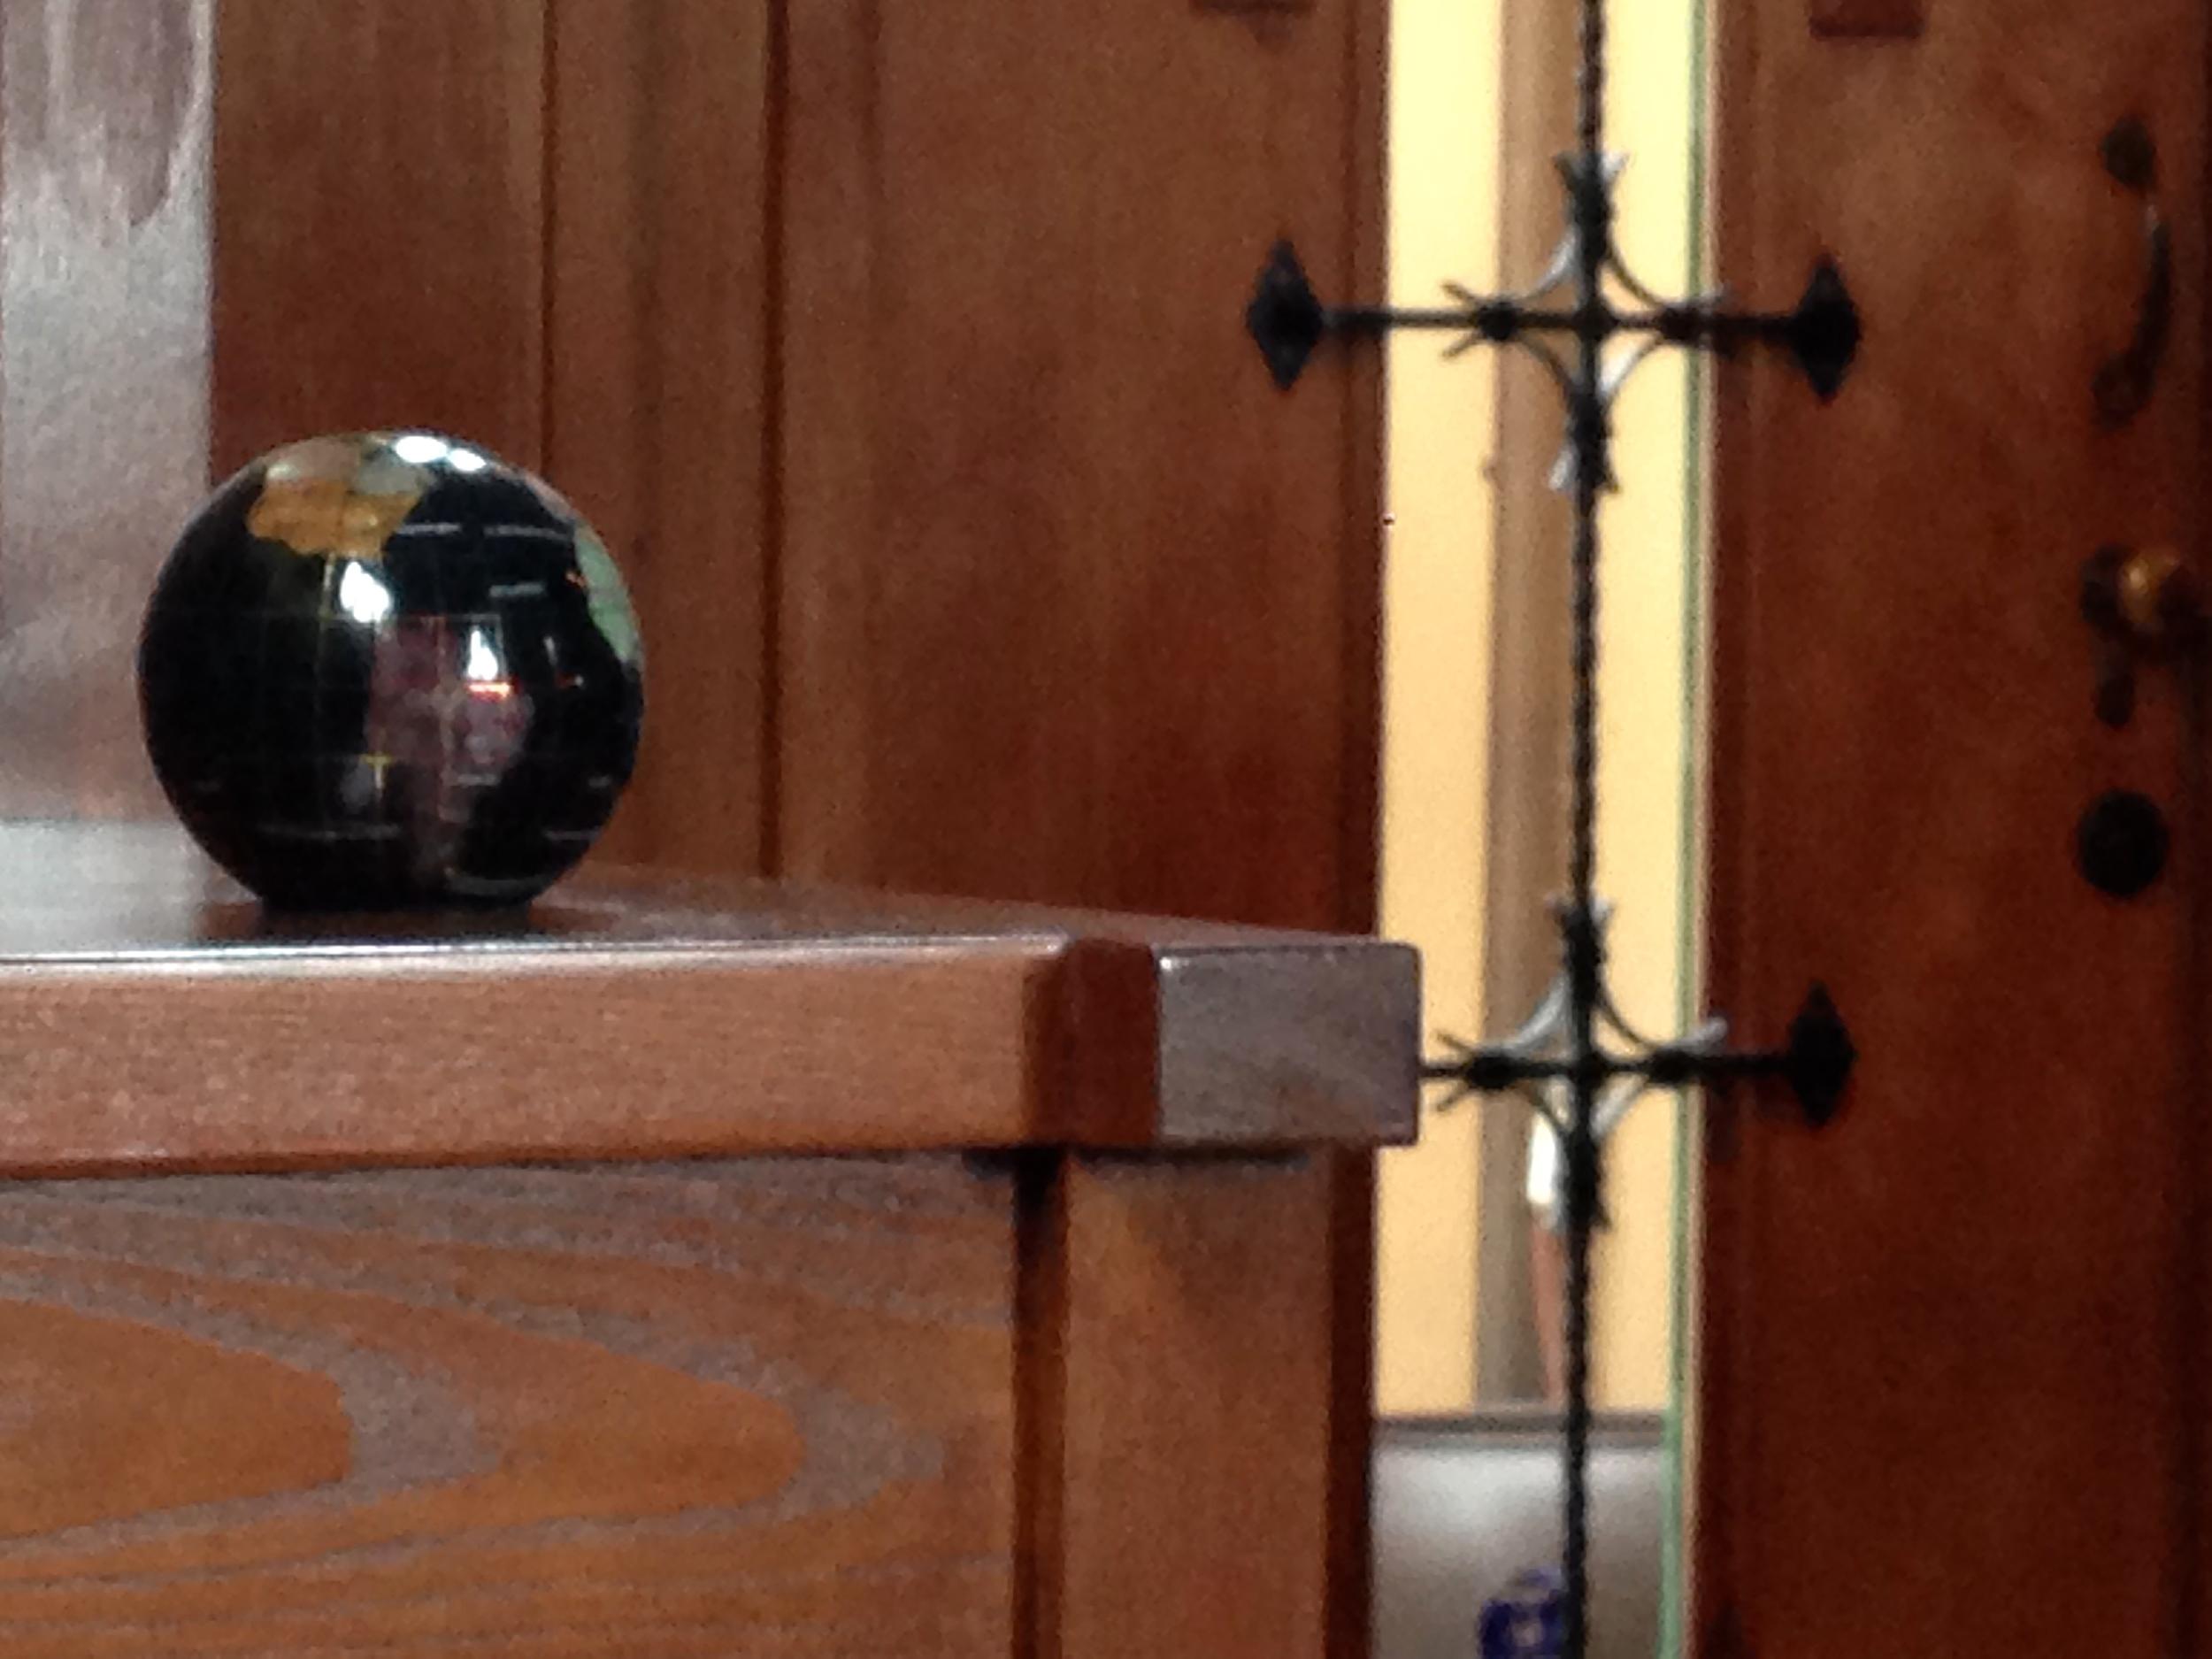 Globe on the stair step shelves.